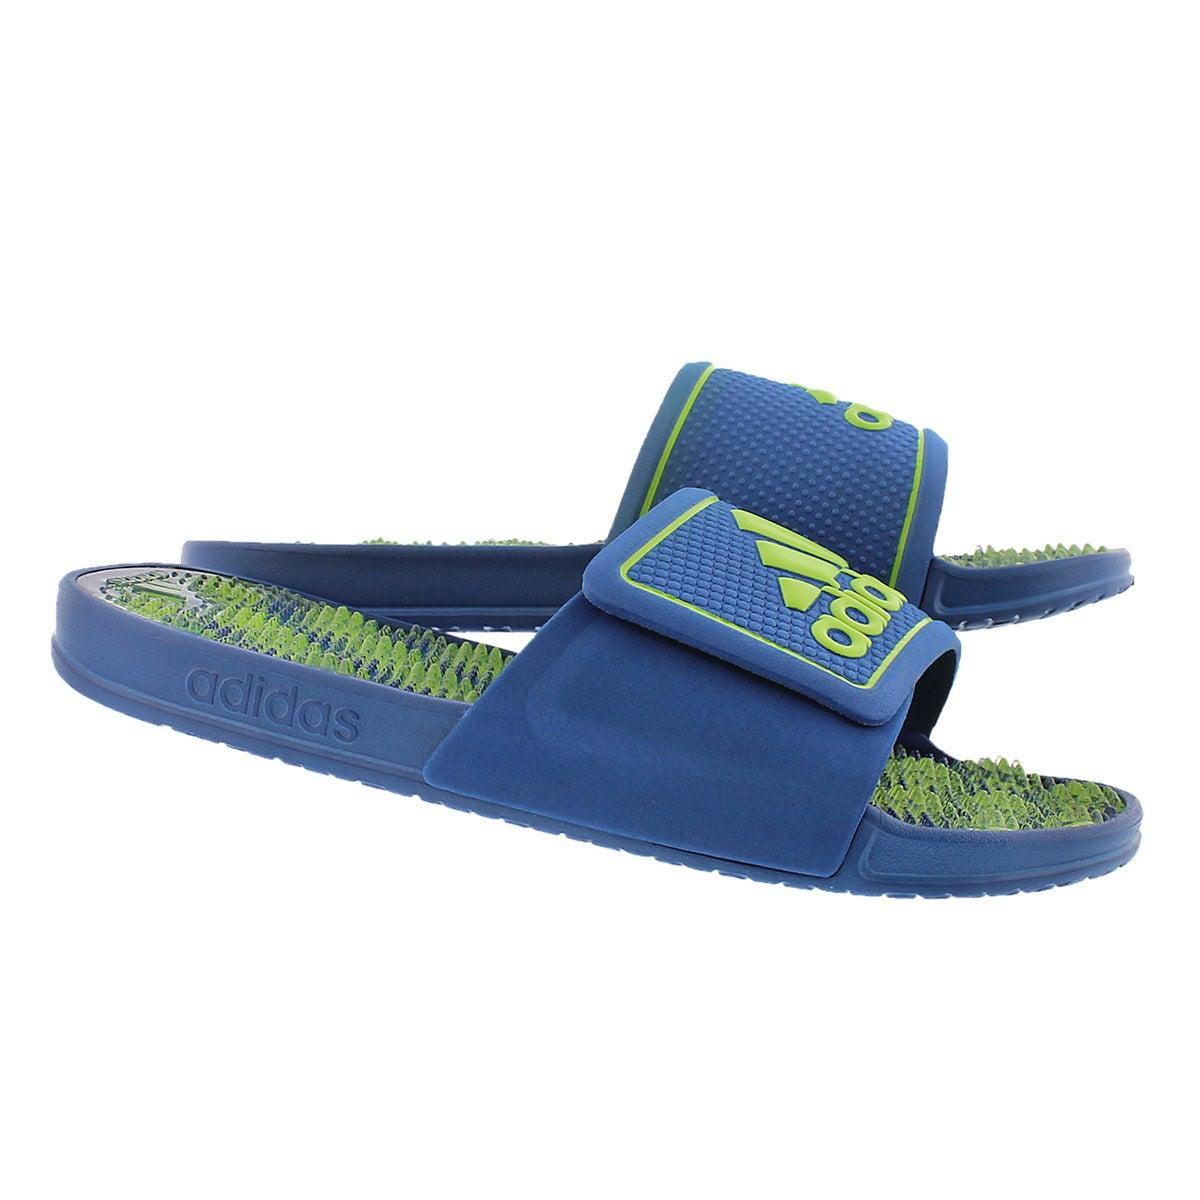 Mns Adissage 2.0 blue/lime slide sandal